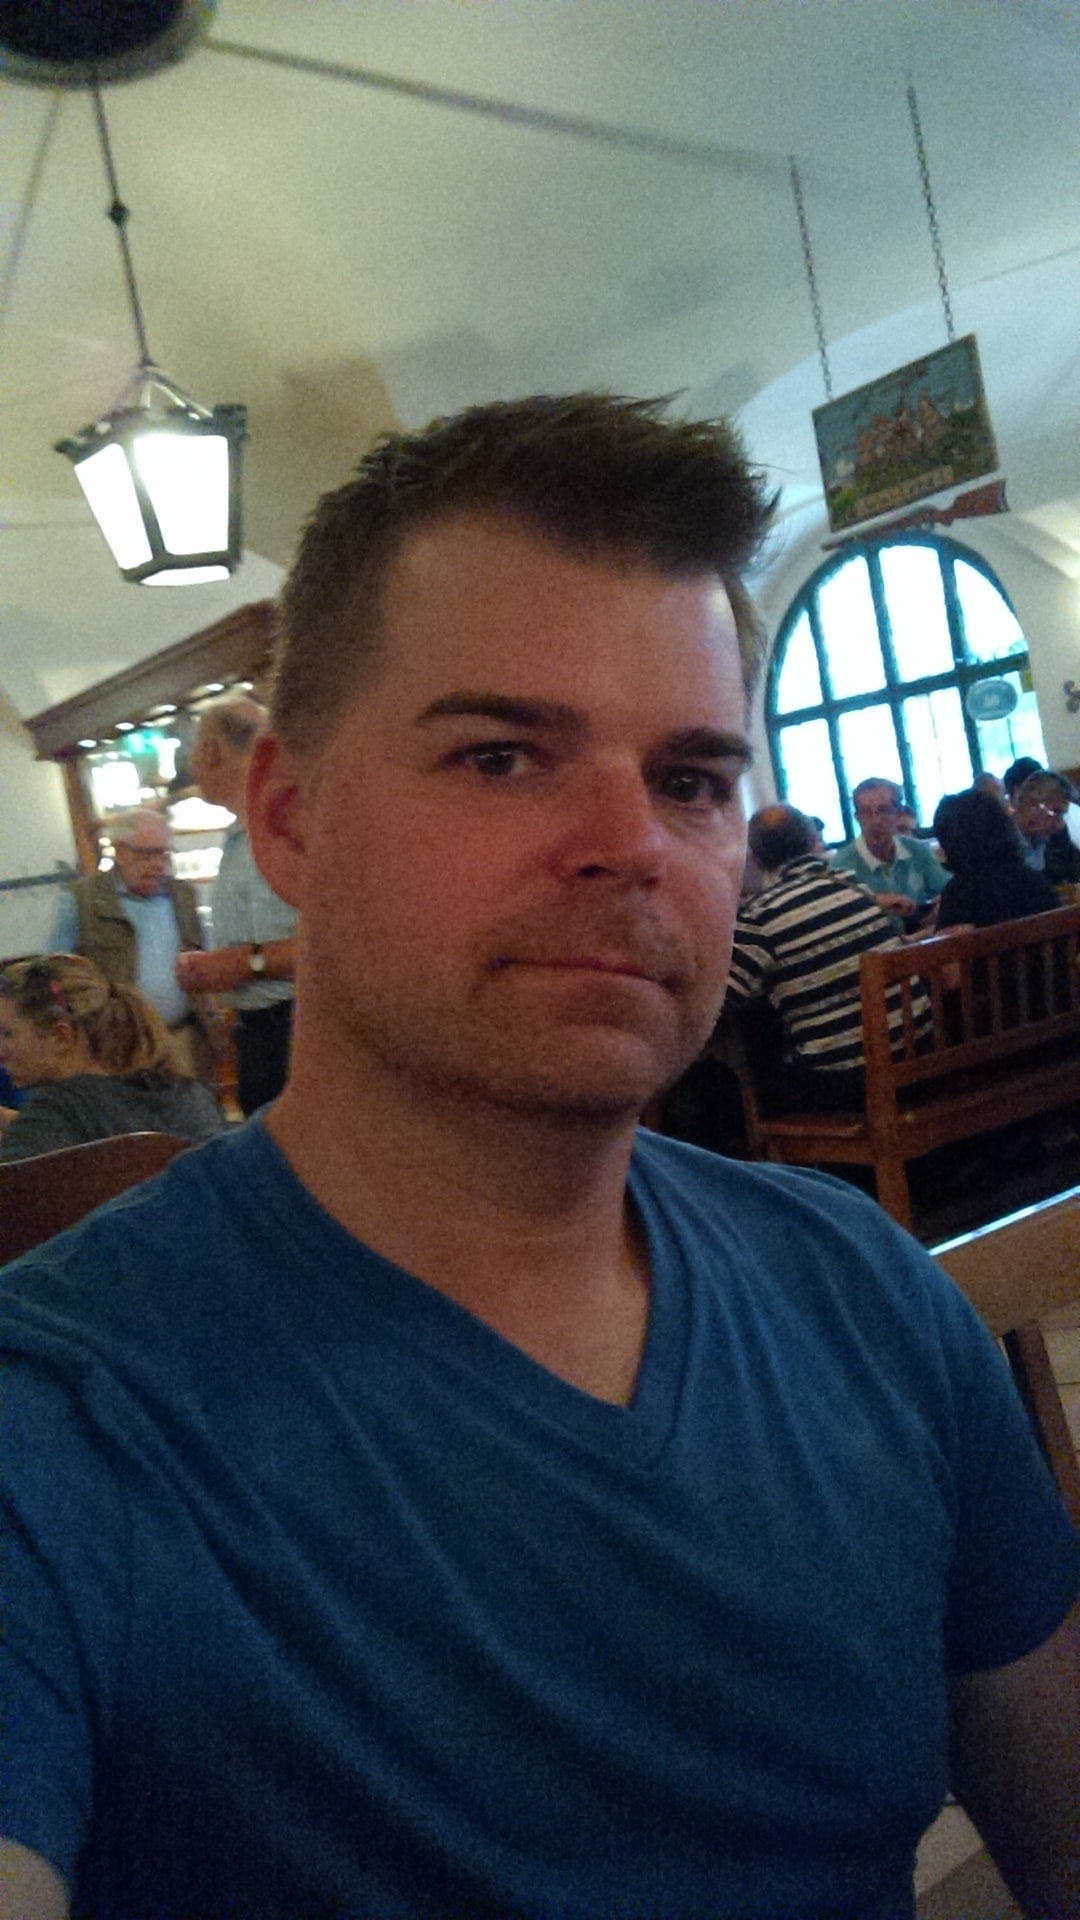 David from Tampa